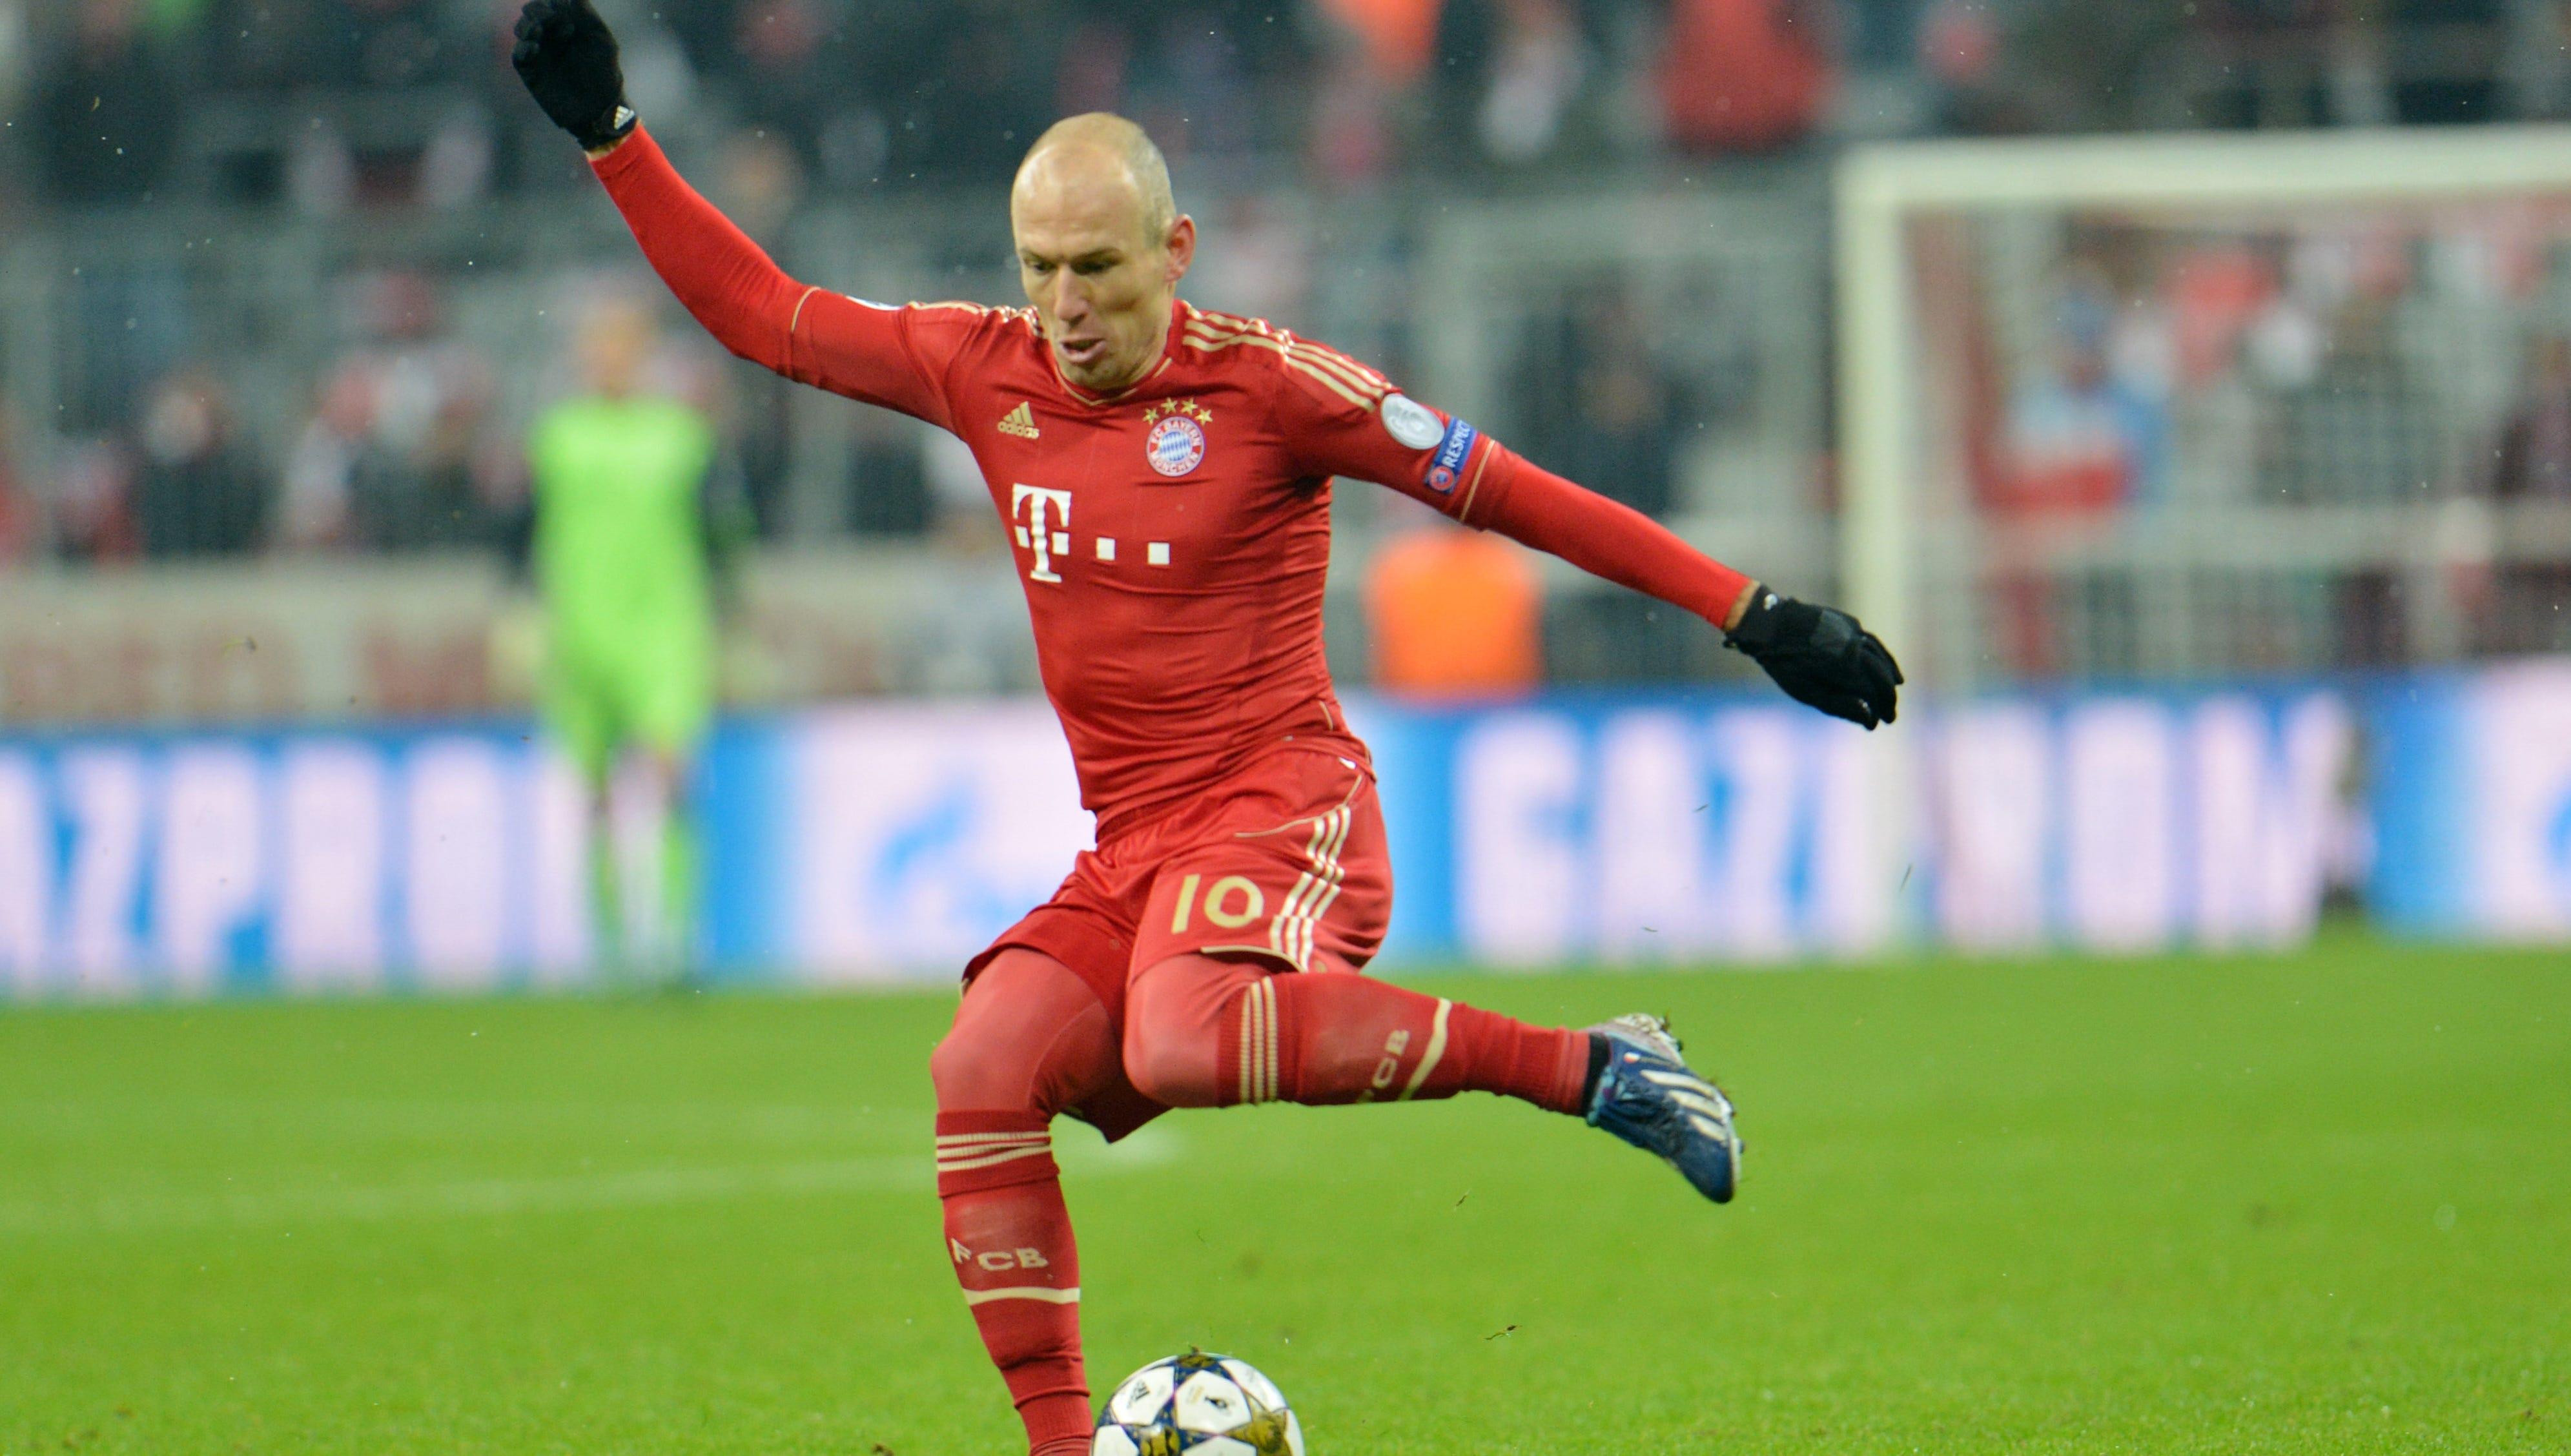 Bayern Munich eliminates Arsenal in Champs League